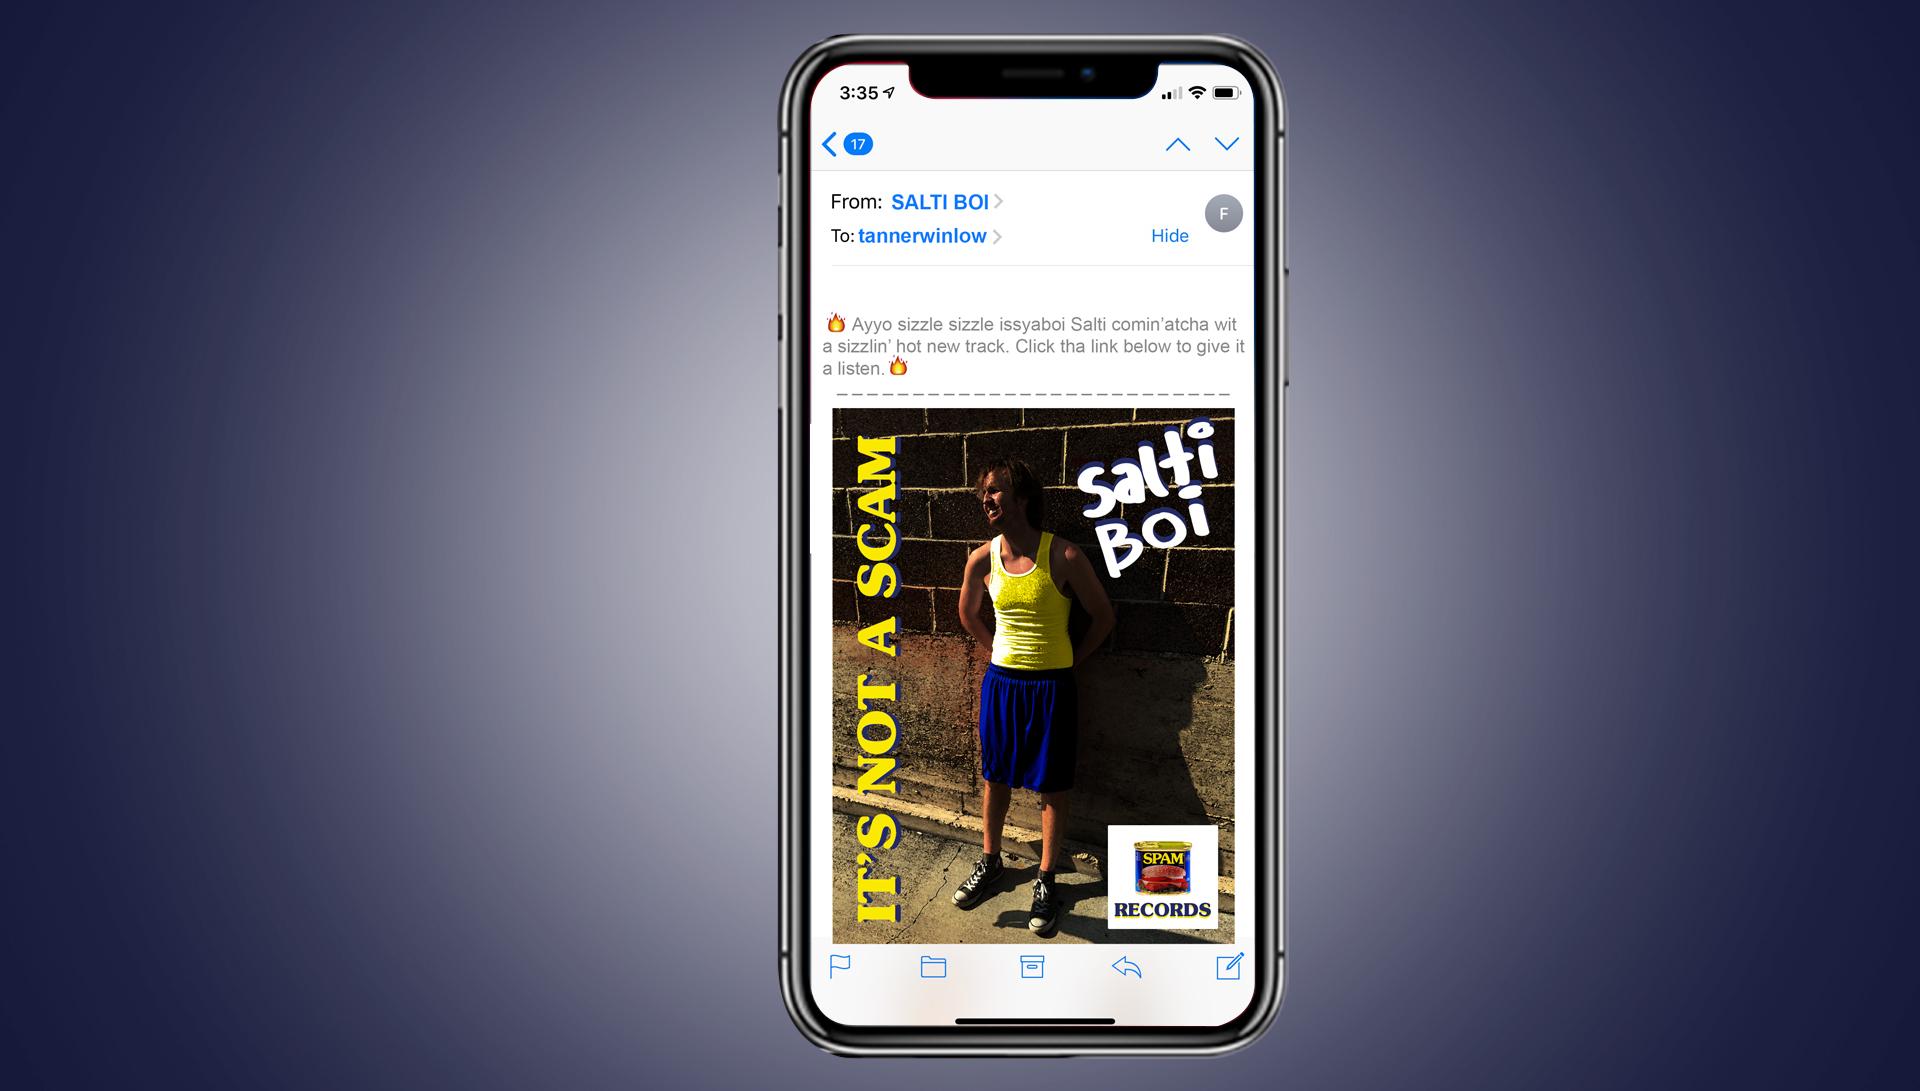 Spam box template Saltiboi email.jpg